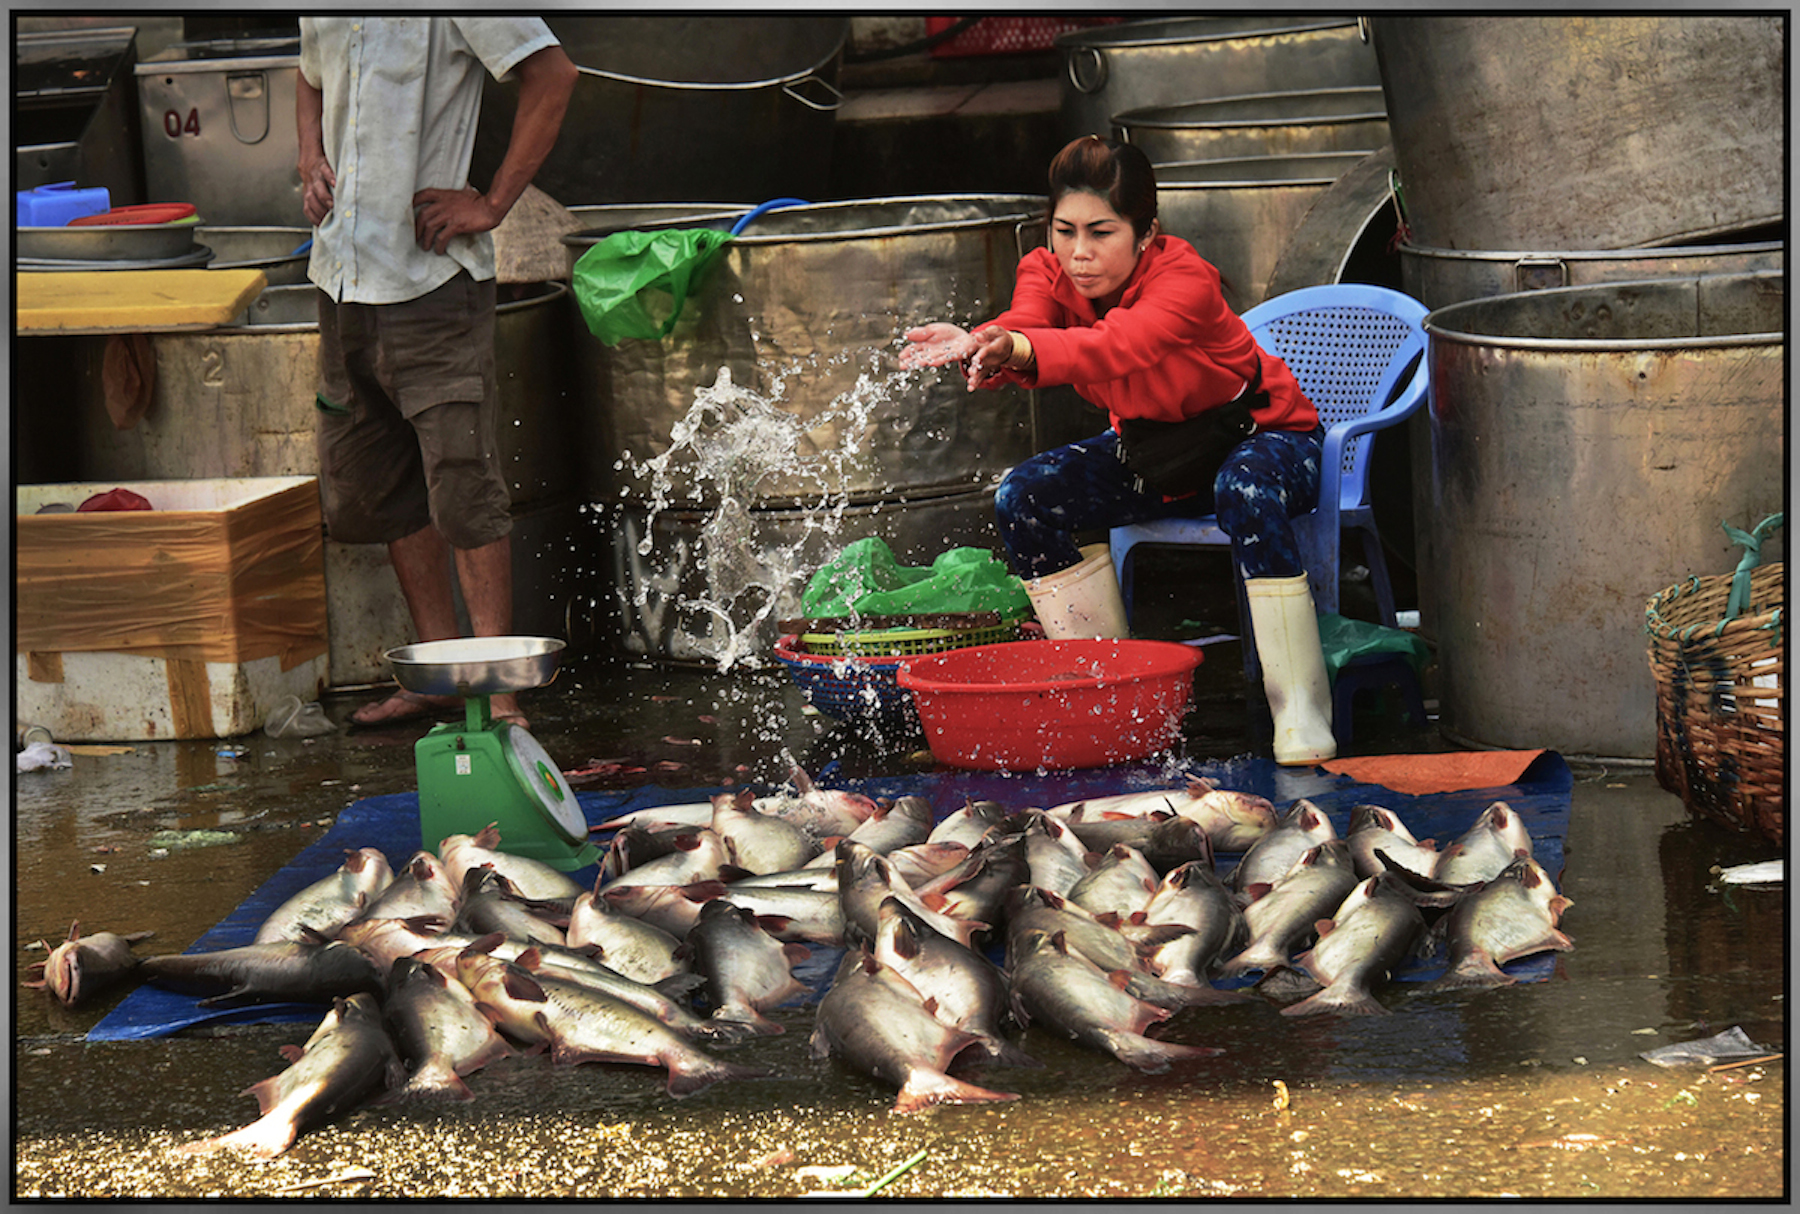 Merchant displays her fish for sale, on a hot afternoon, 105 degrees F. Binh Diem Market, Saigon/HCMC, Dec. 2015.#7814